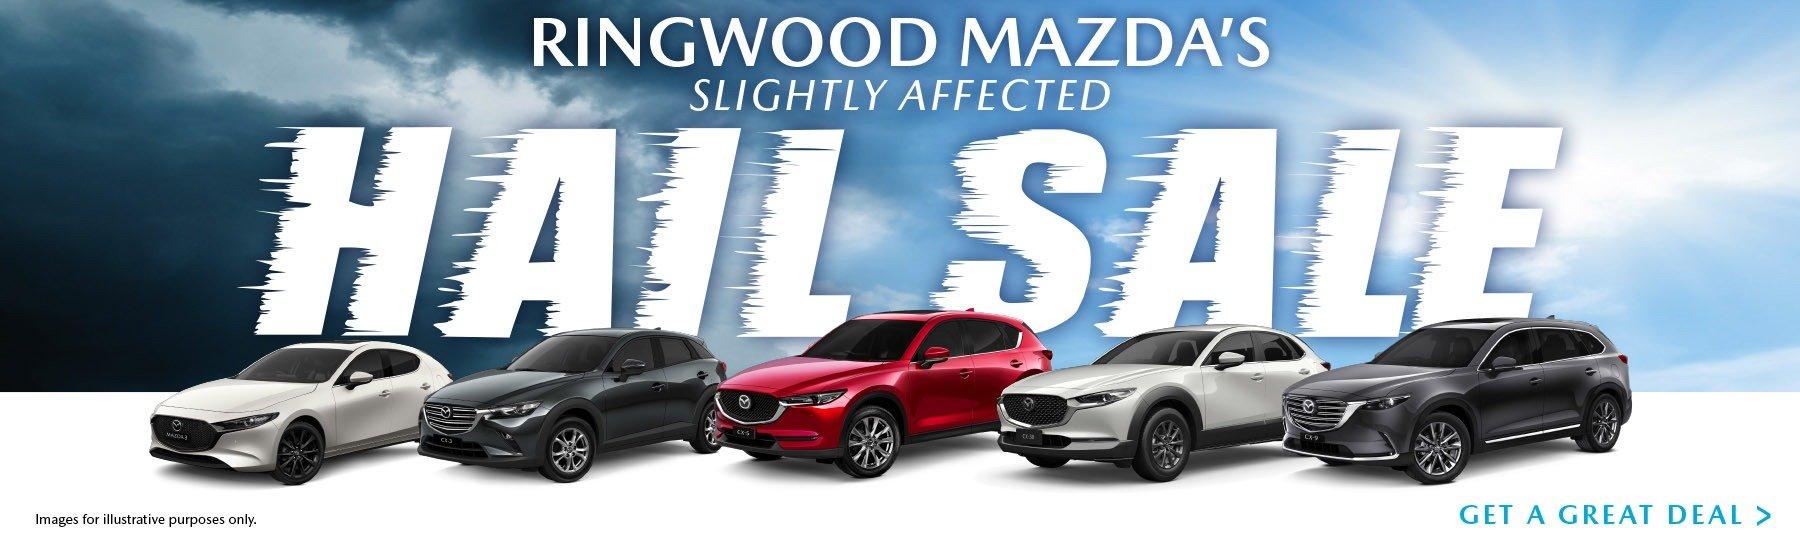 Ringwood Mazda Hail Sale